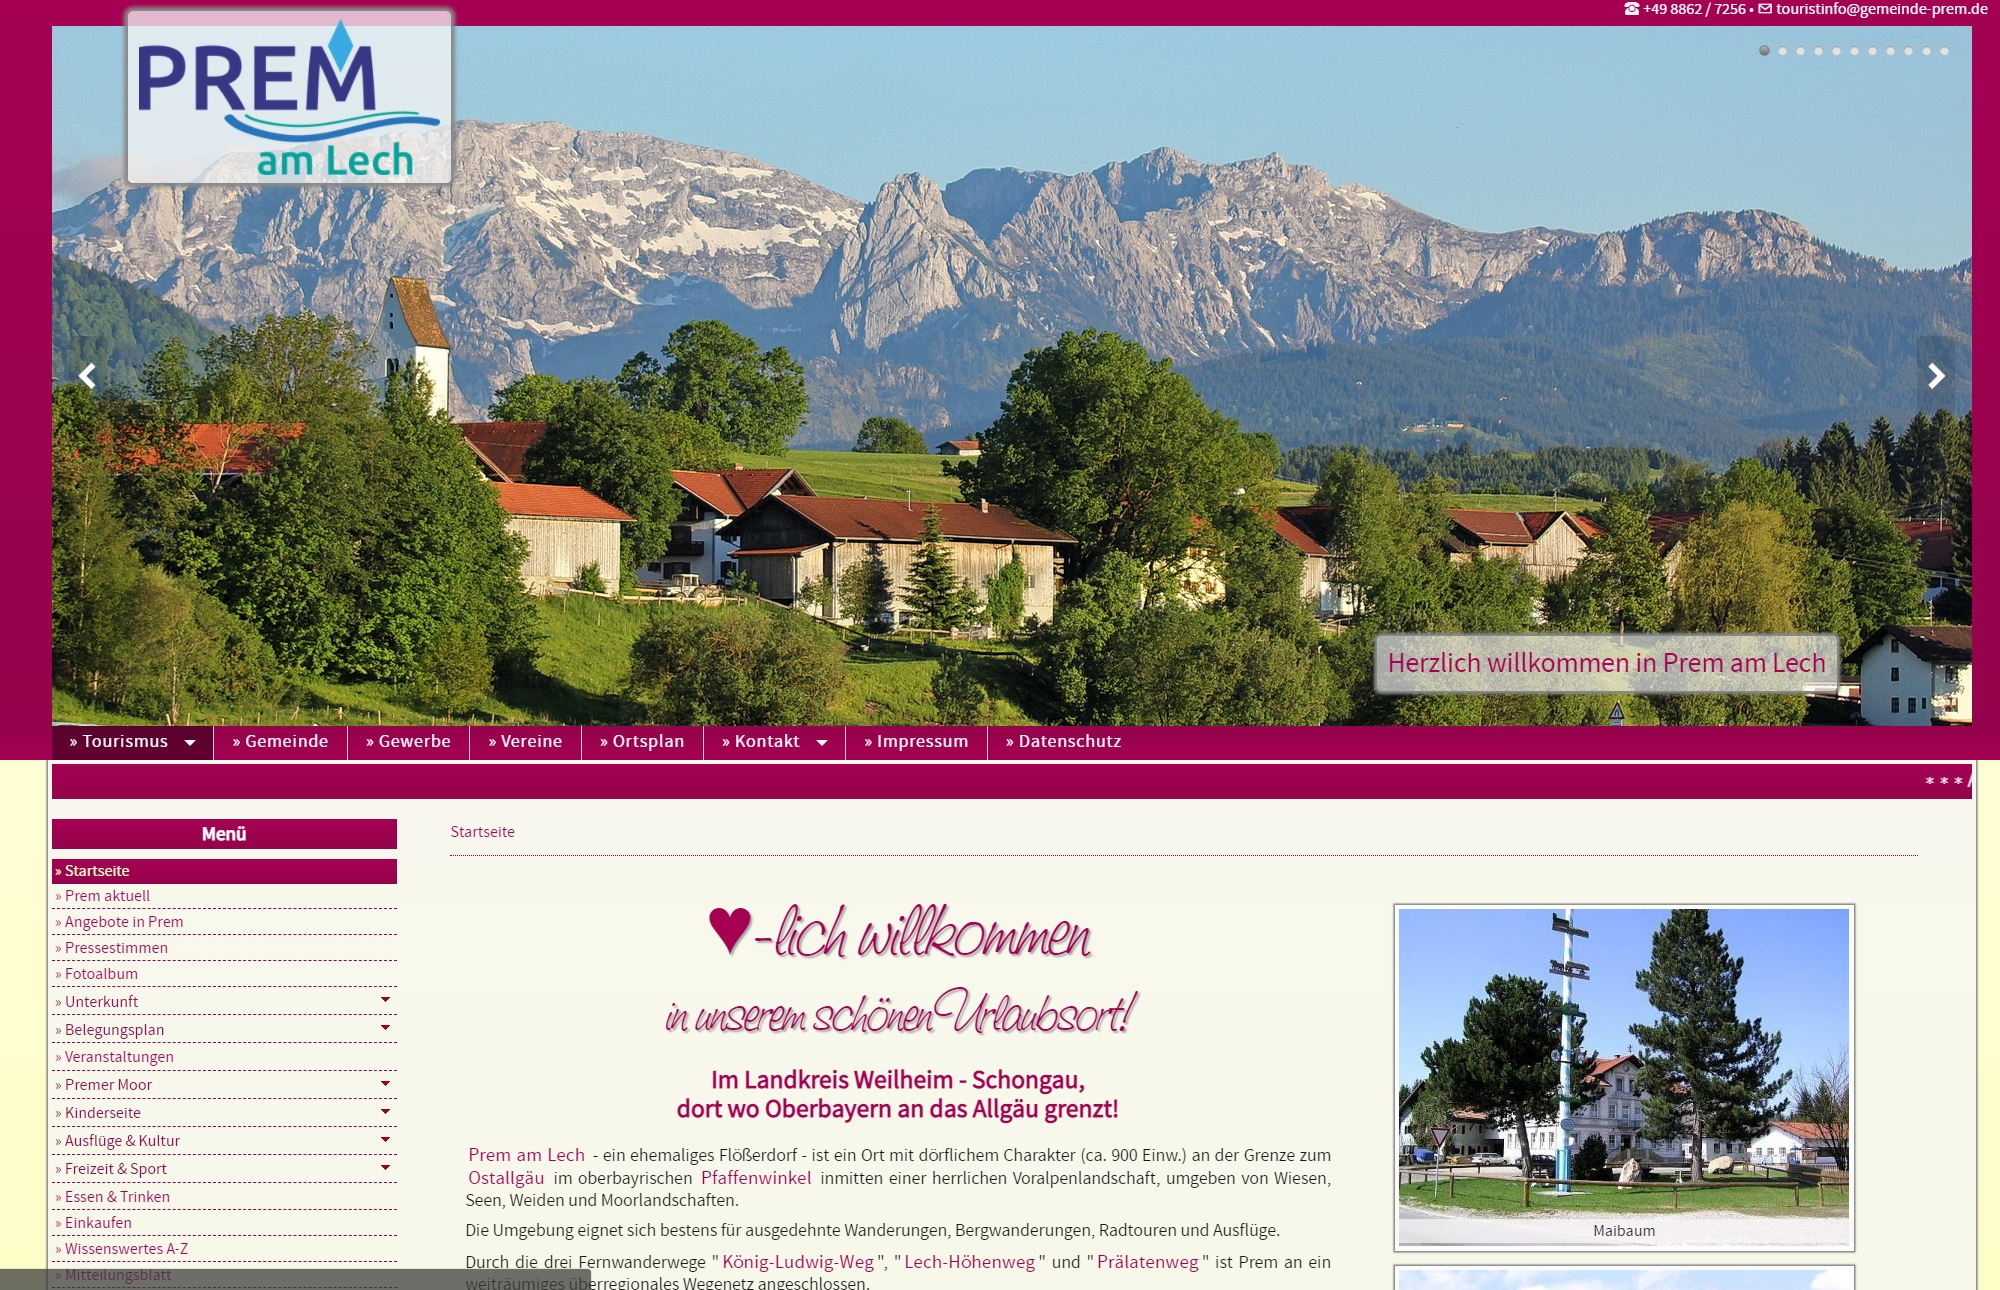 Tourist Info Prem am Lech